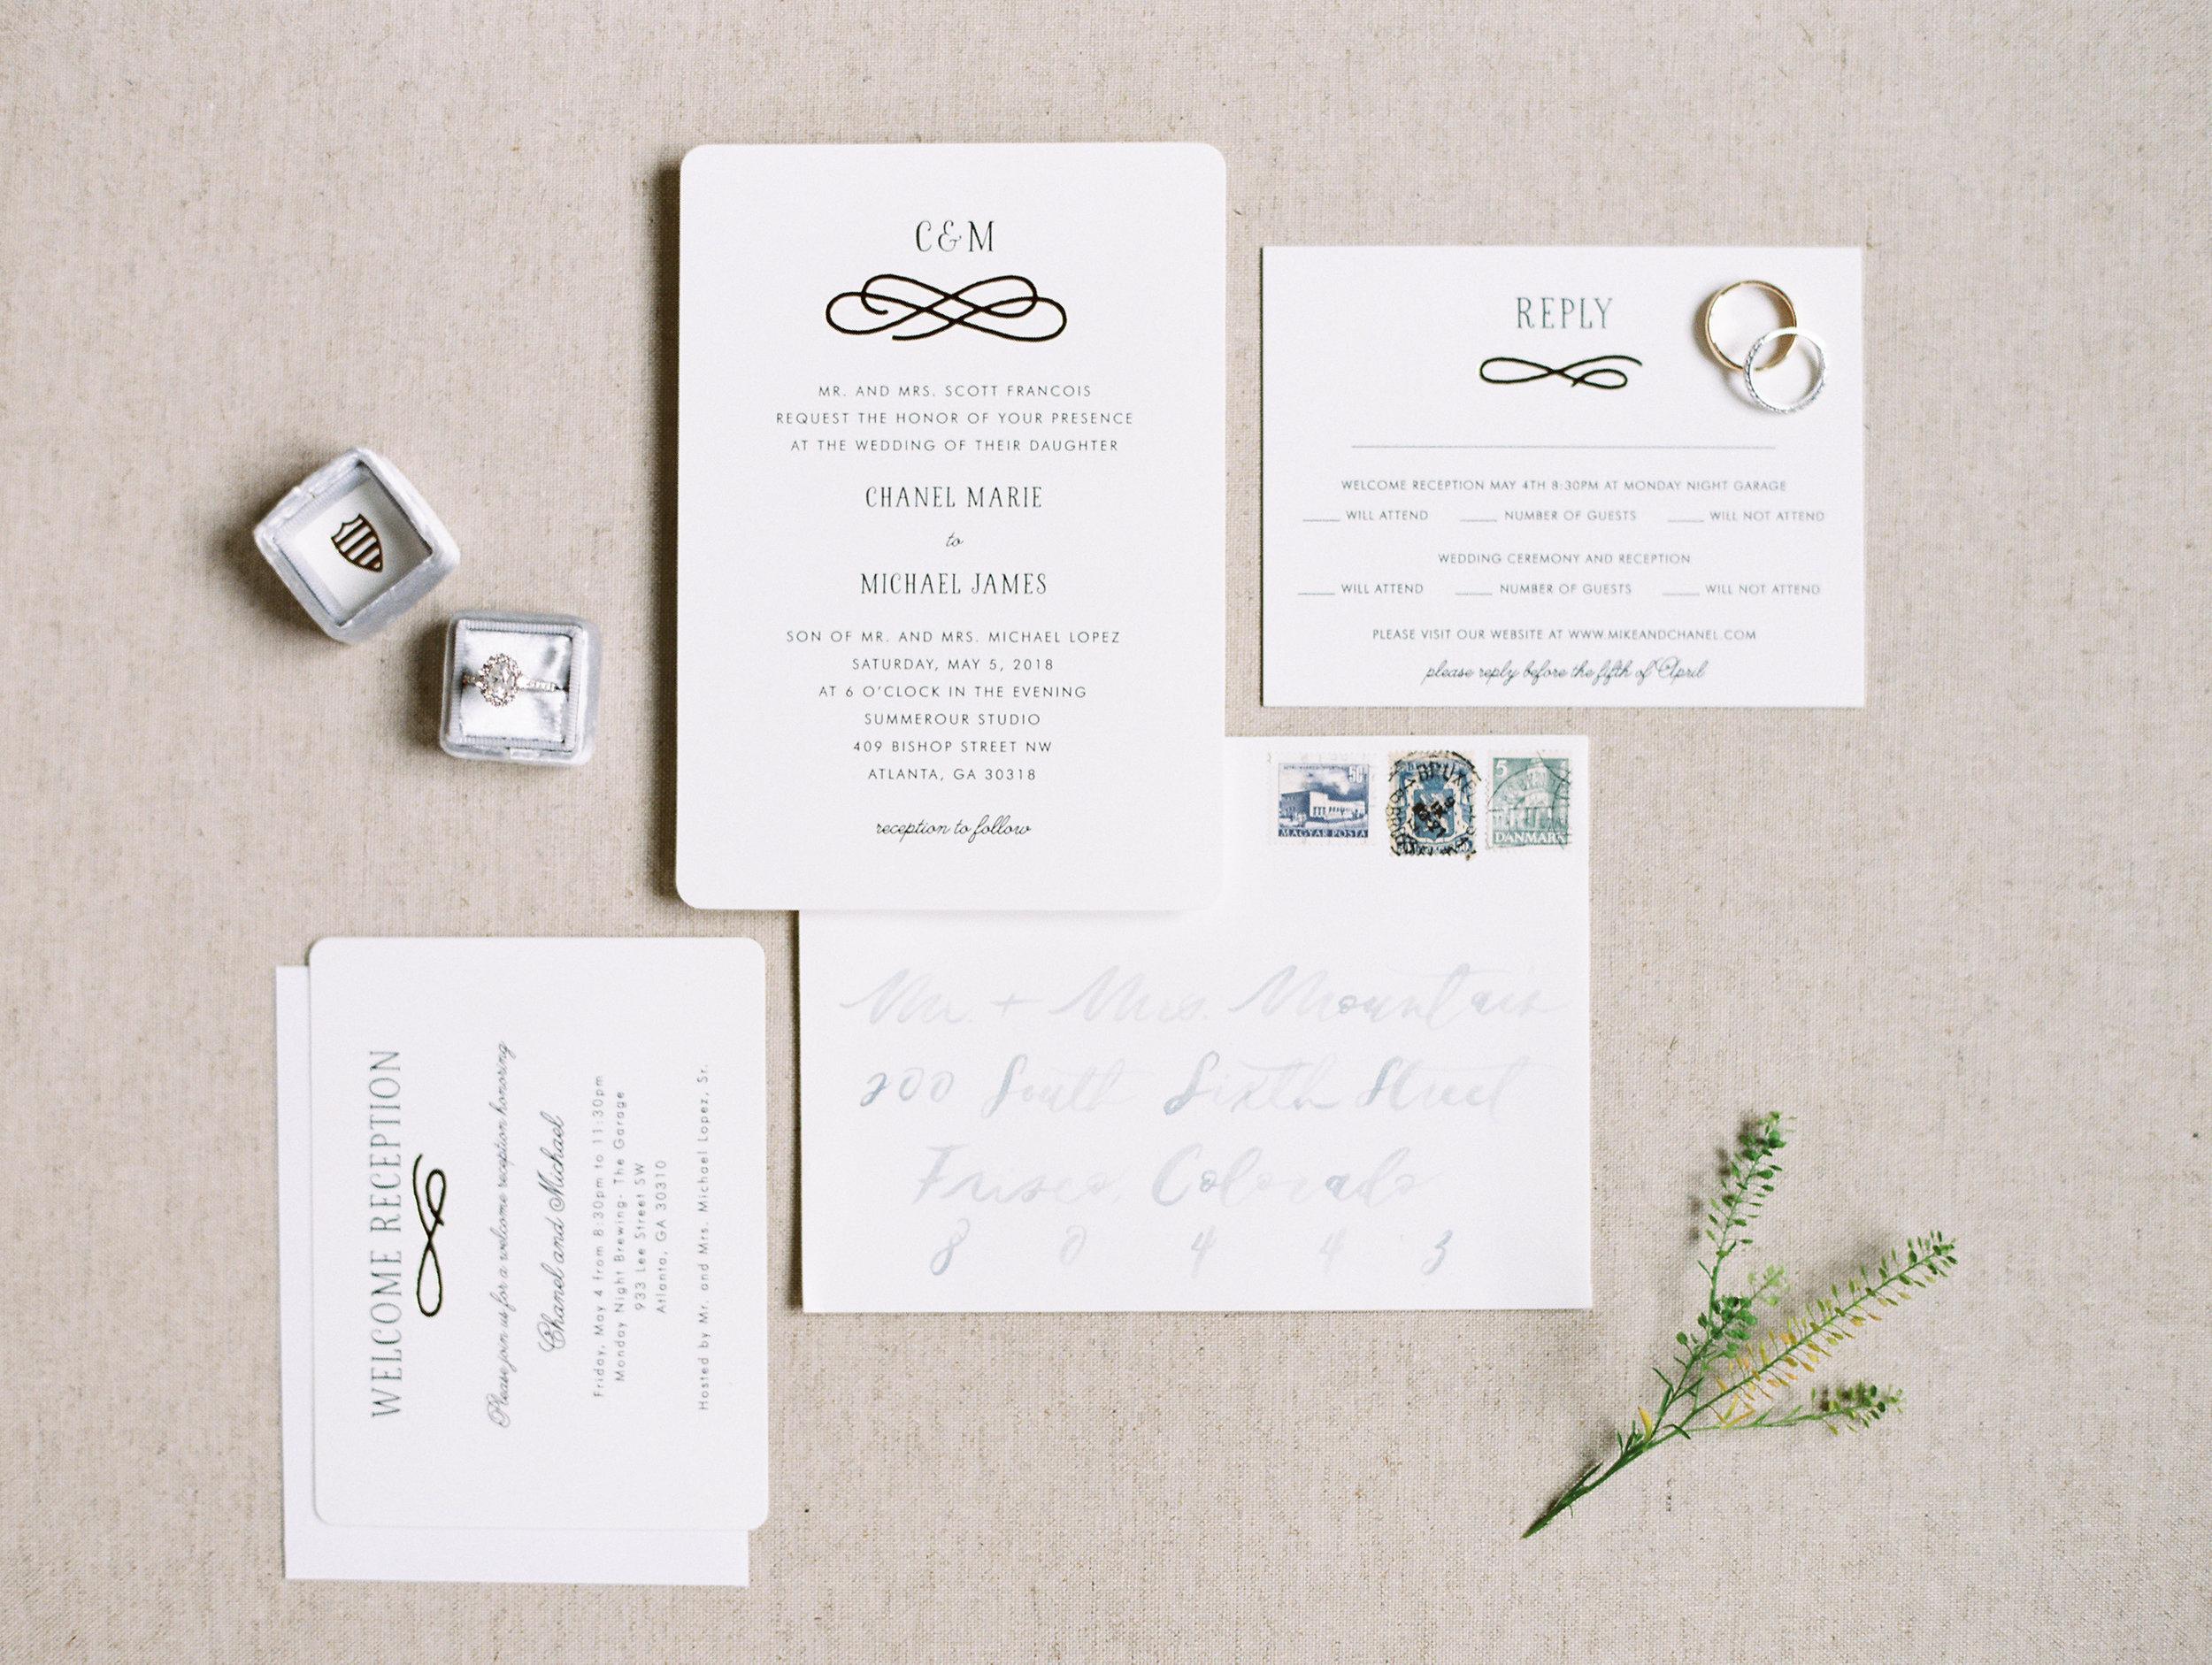 Romantic-Summerour-studio-wedding-hannah-forsberg-atlanta-wedding-photographer35.JPG